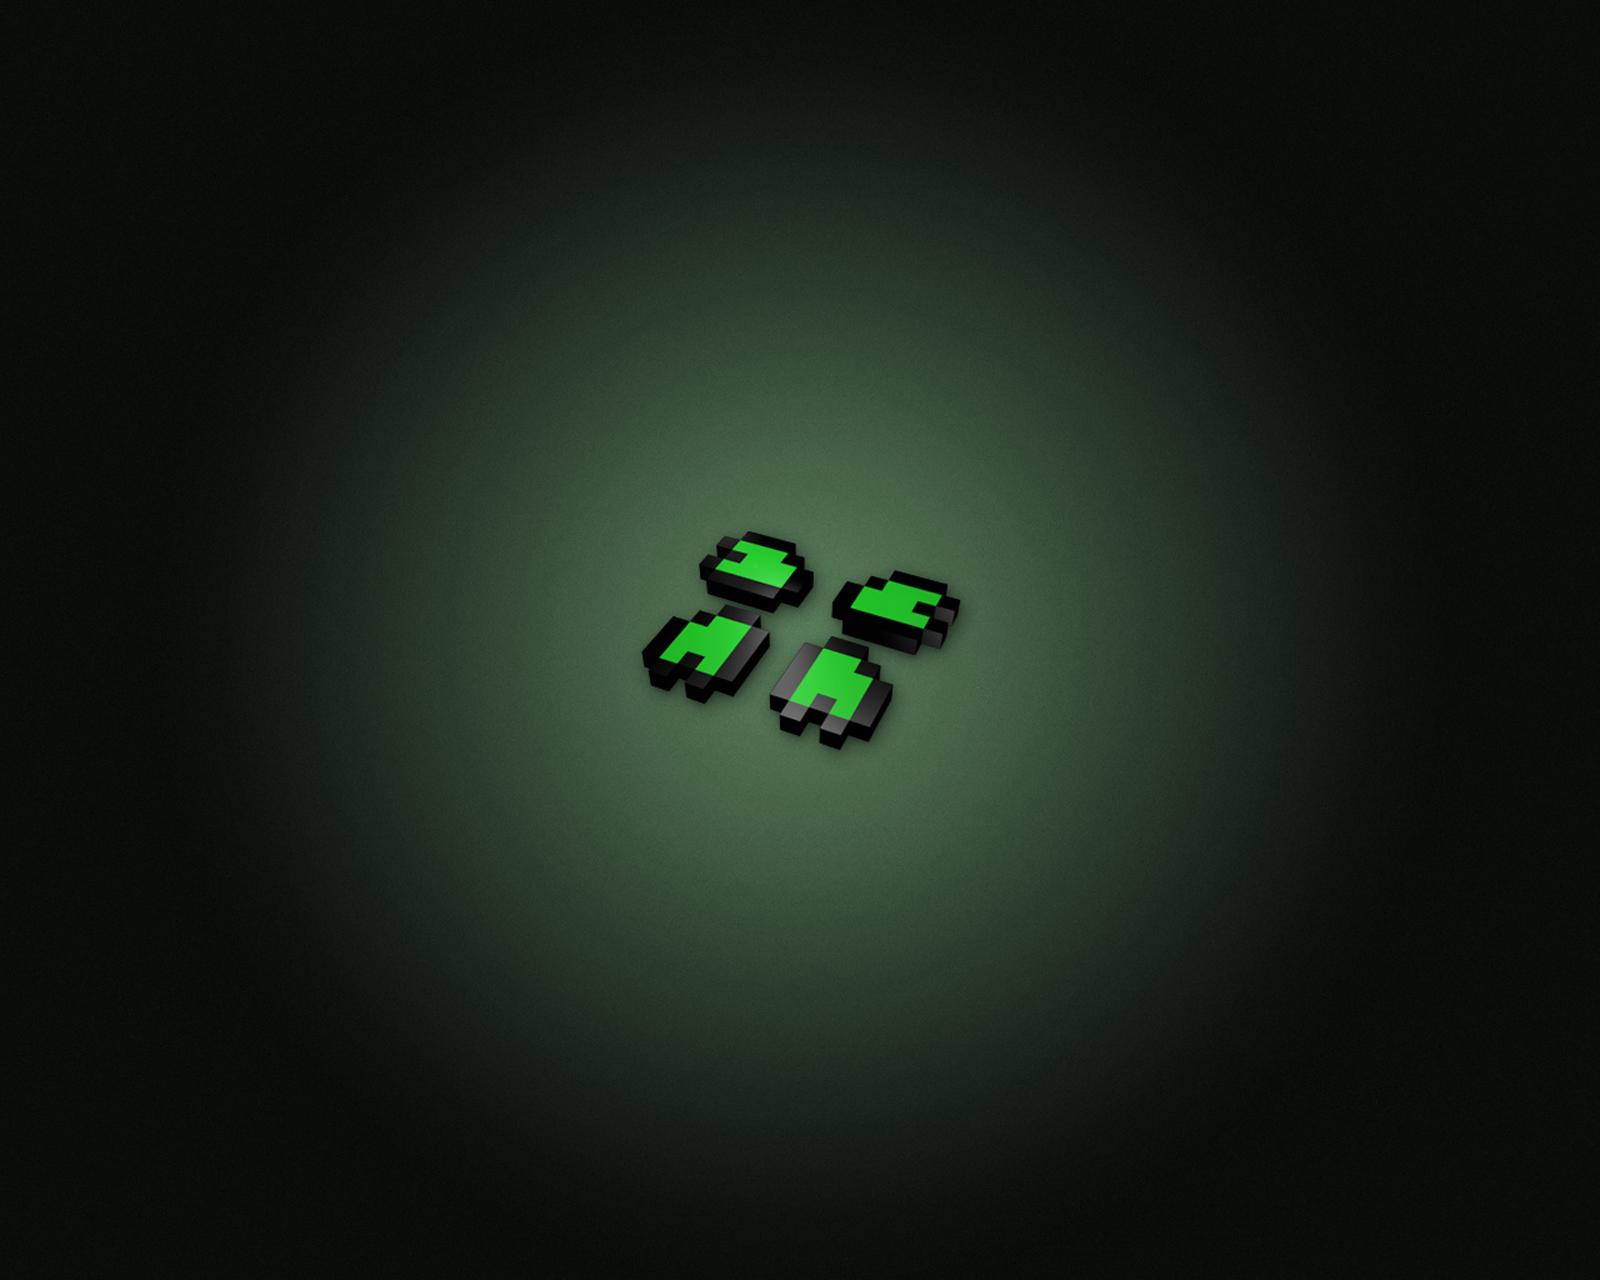 http://3.bp.blogspot.com/-Y9HwYvxxW00/TnZAbZBTfrI/AAAAAAAABII/M0A_LBE4vts/s1600/4chan_logo_background_anonymosu_hd__Vvallpaper.net.jpg